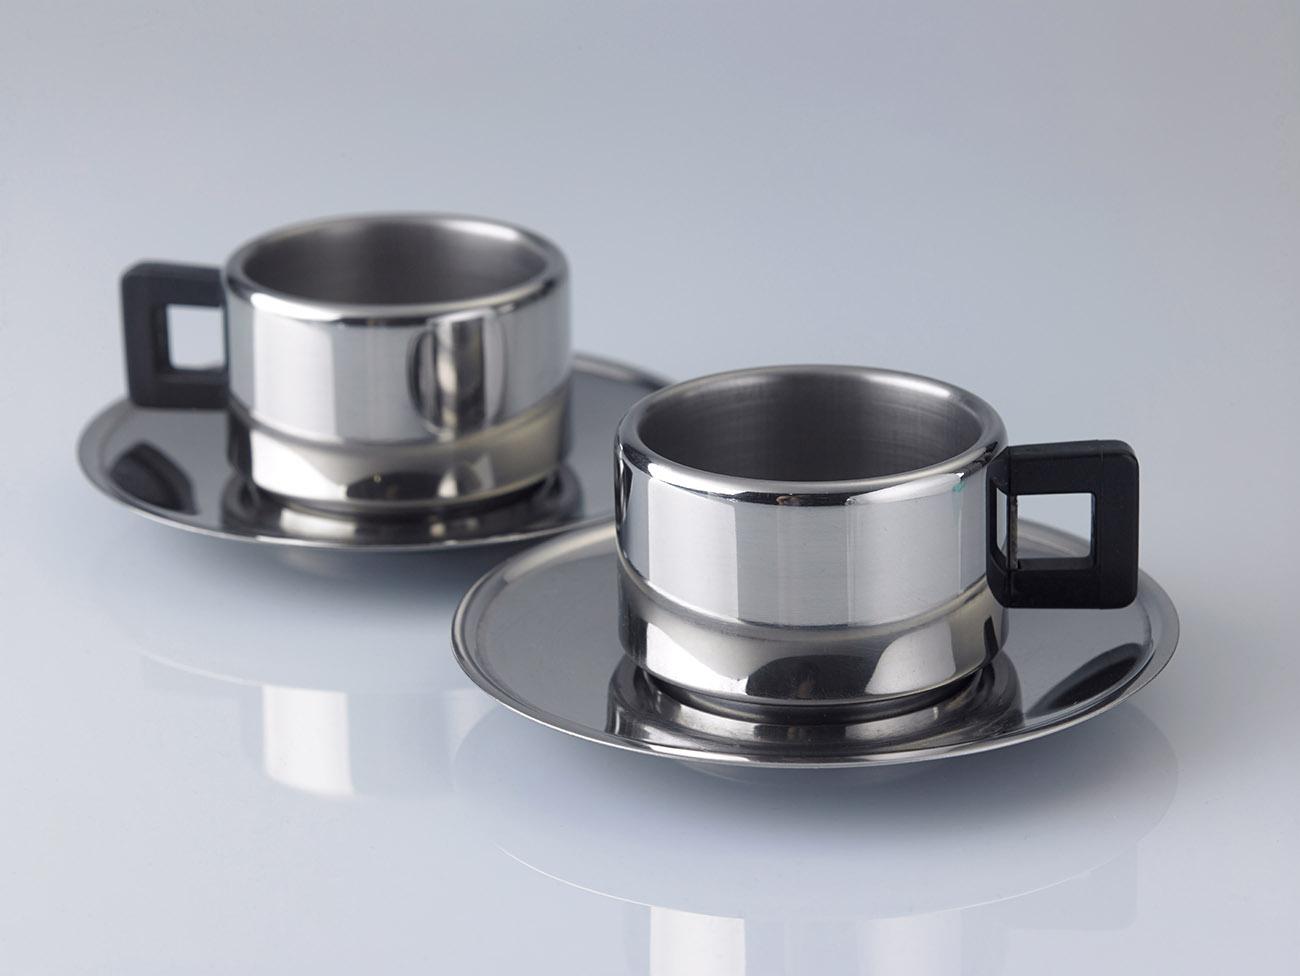 Stainless-steel mug